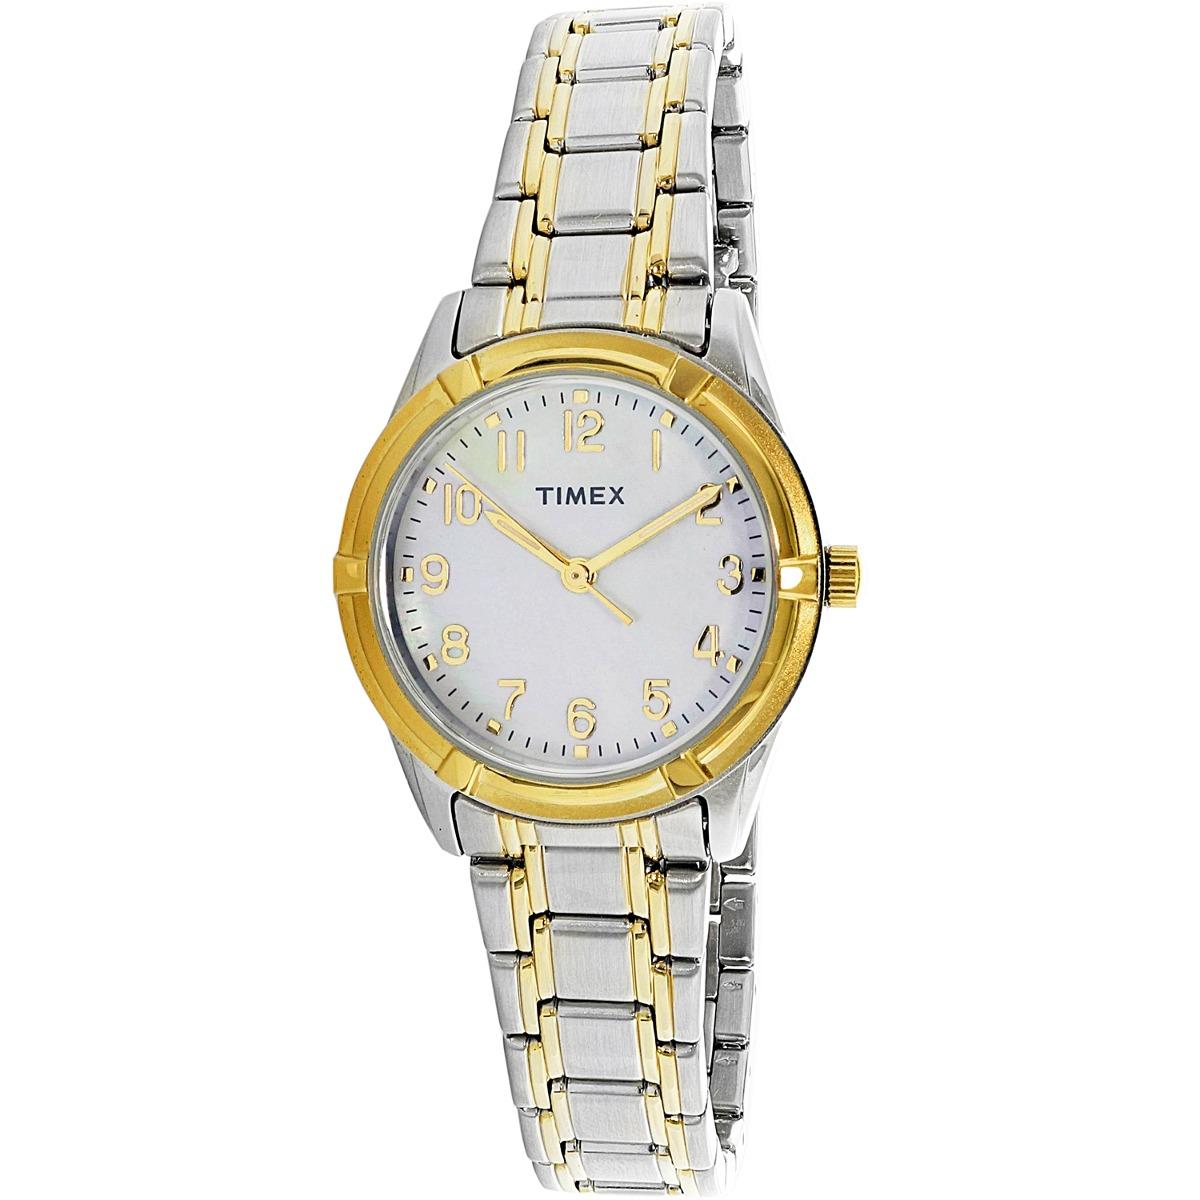 68ab5f9d8bc5 Reloj Timex Para Mujer Tw2p76100 Easton Avenue Pulso En -   175.550 ...